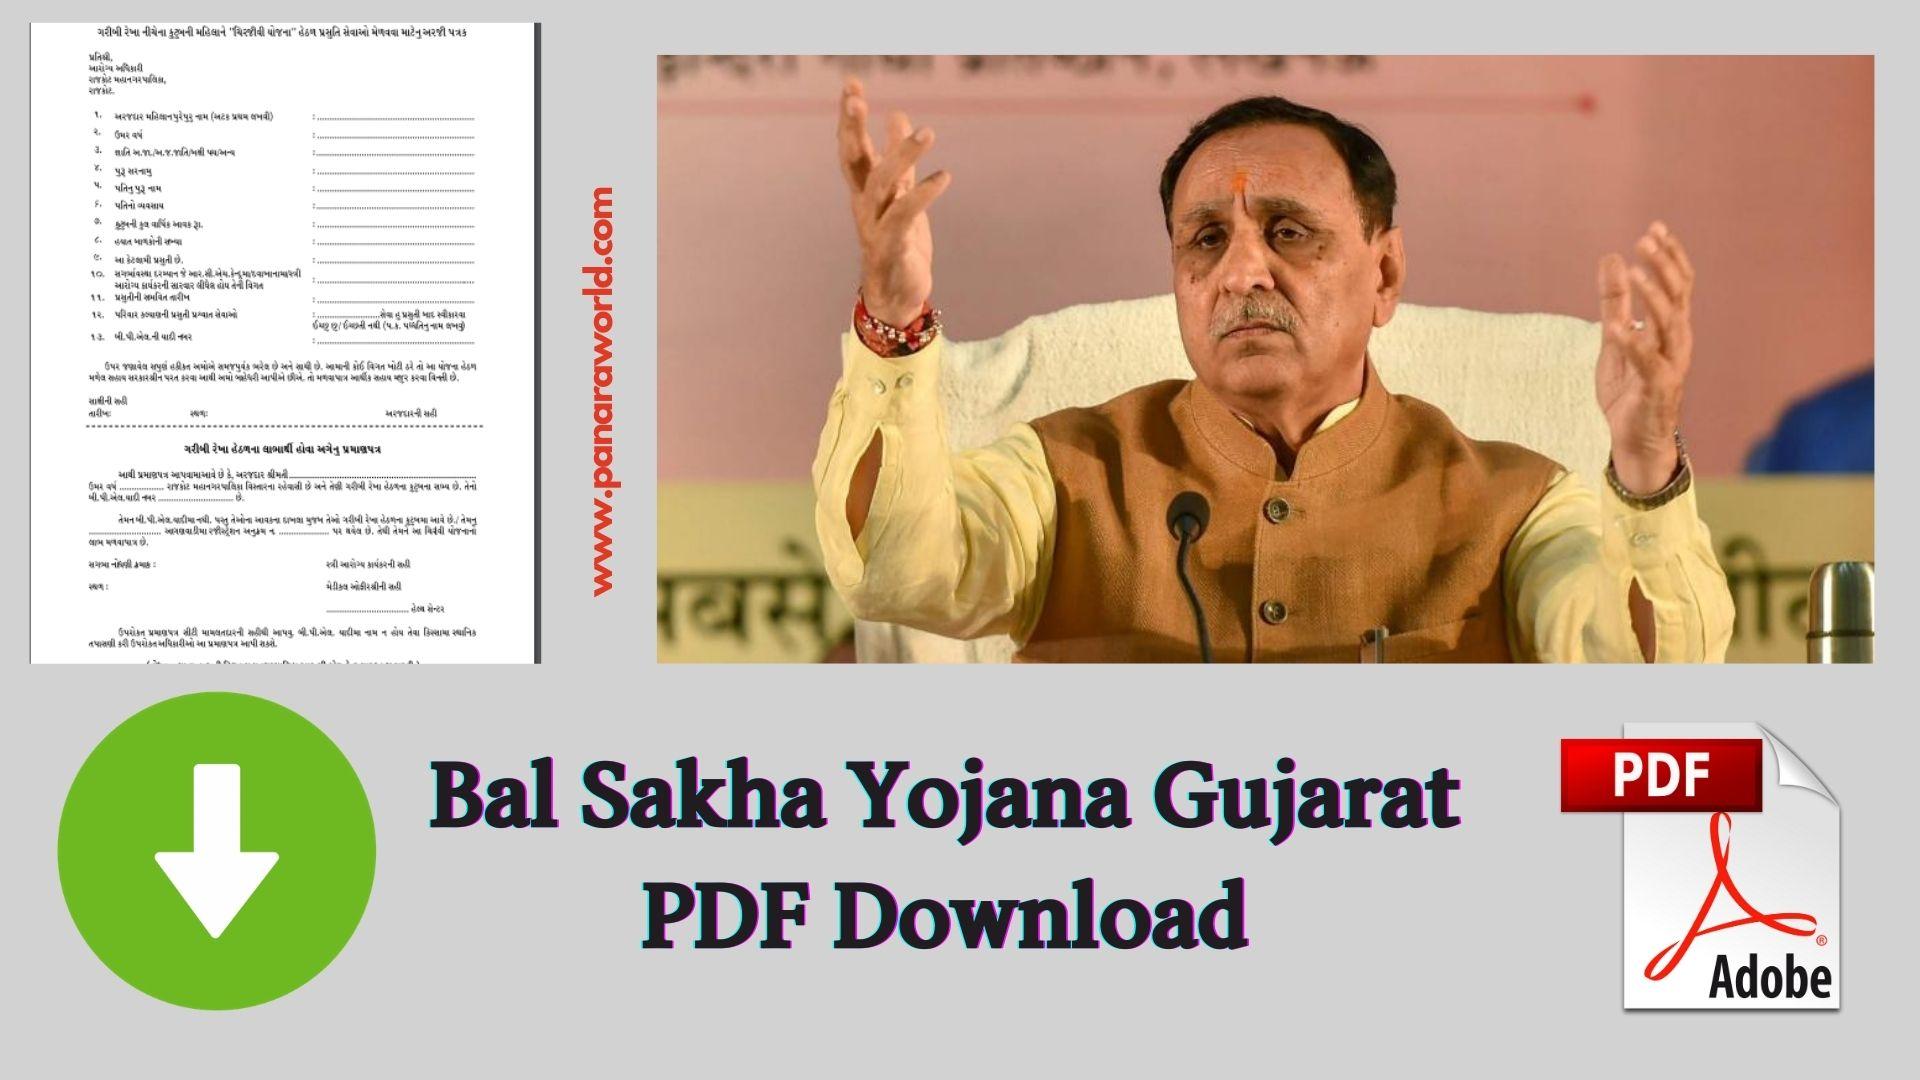 Bal Sakha Yojana Gujarat PDF Download Chiranjeevi Yojana